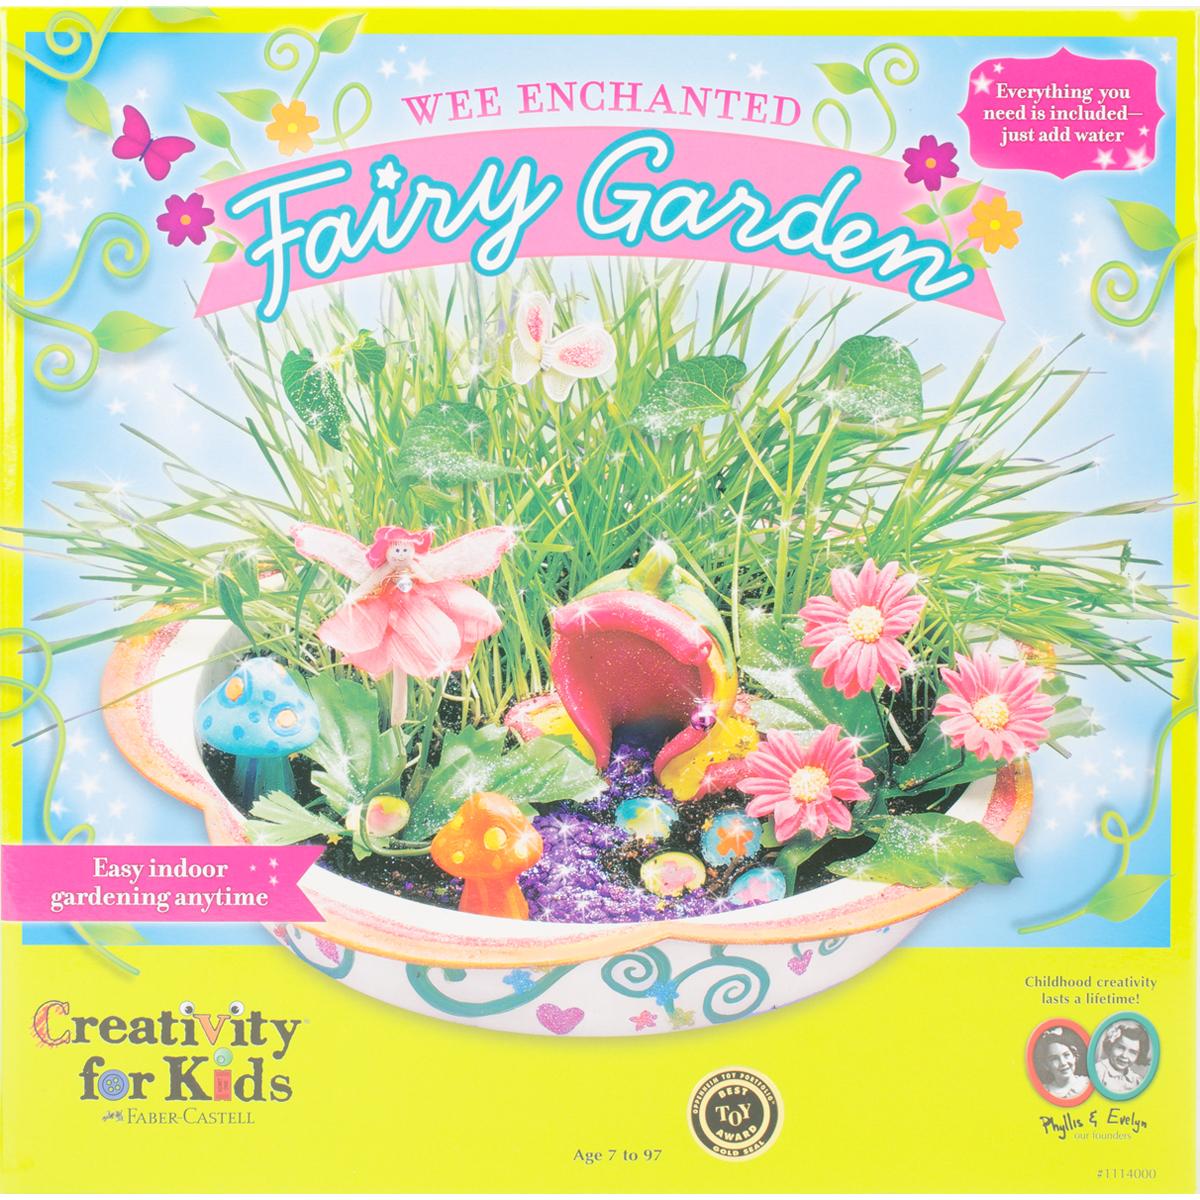 Wee Enchanted Fairy Garden Kit-